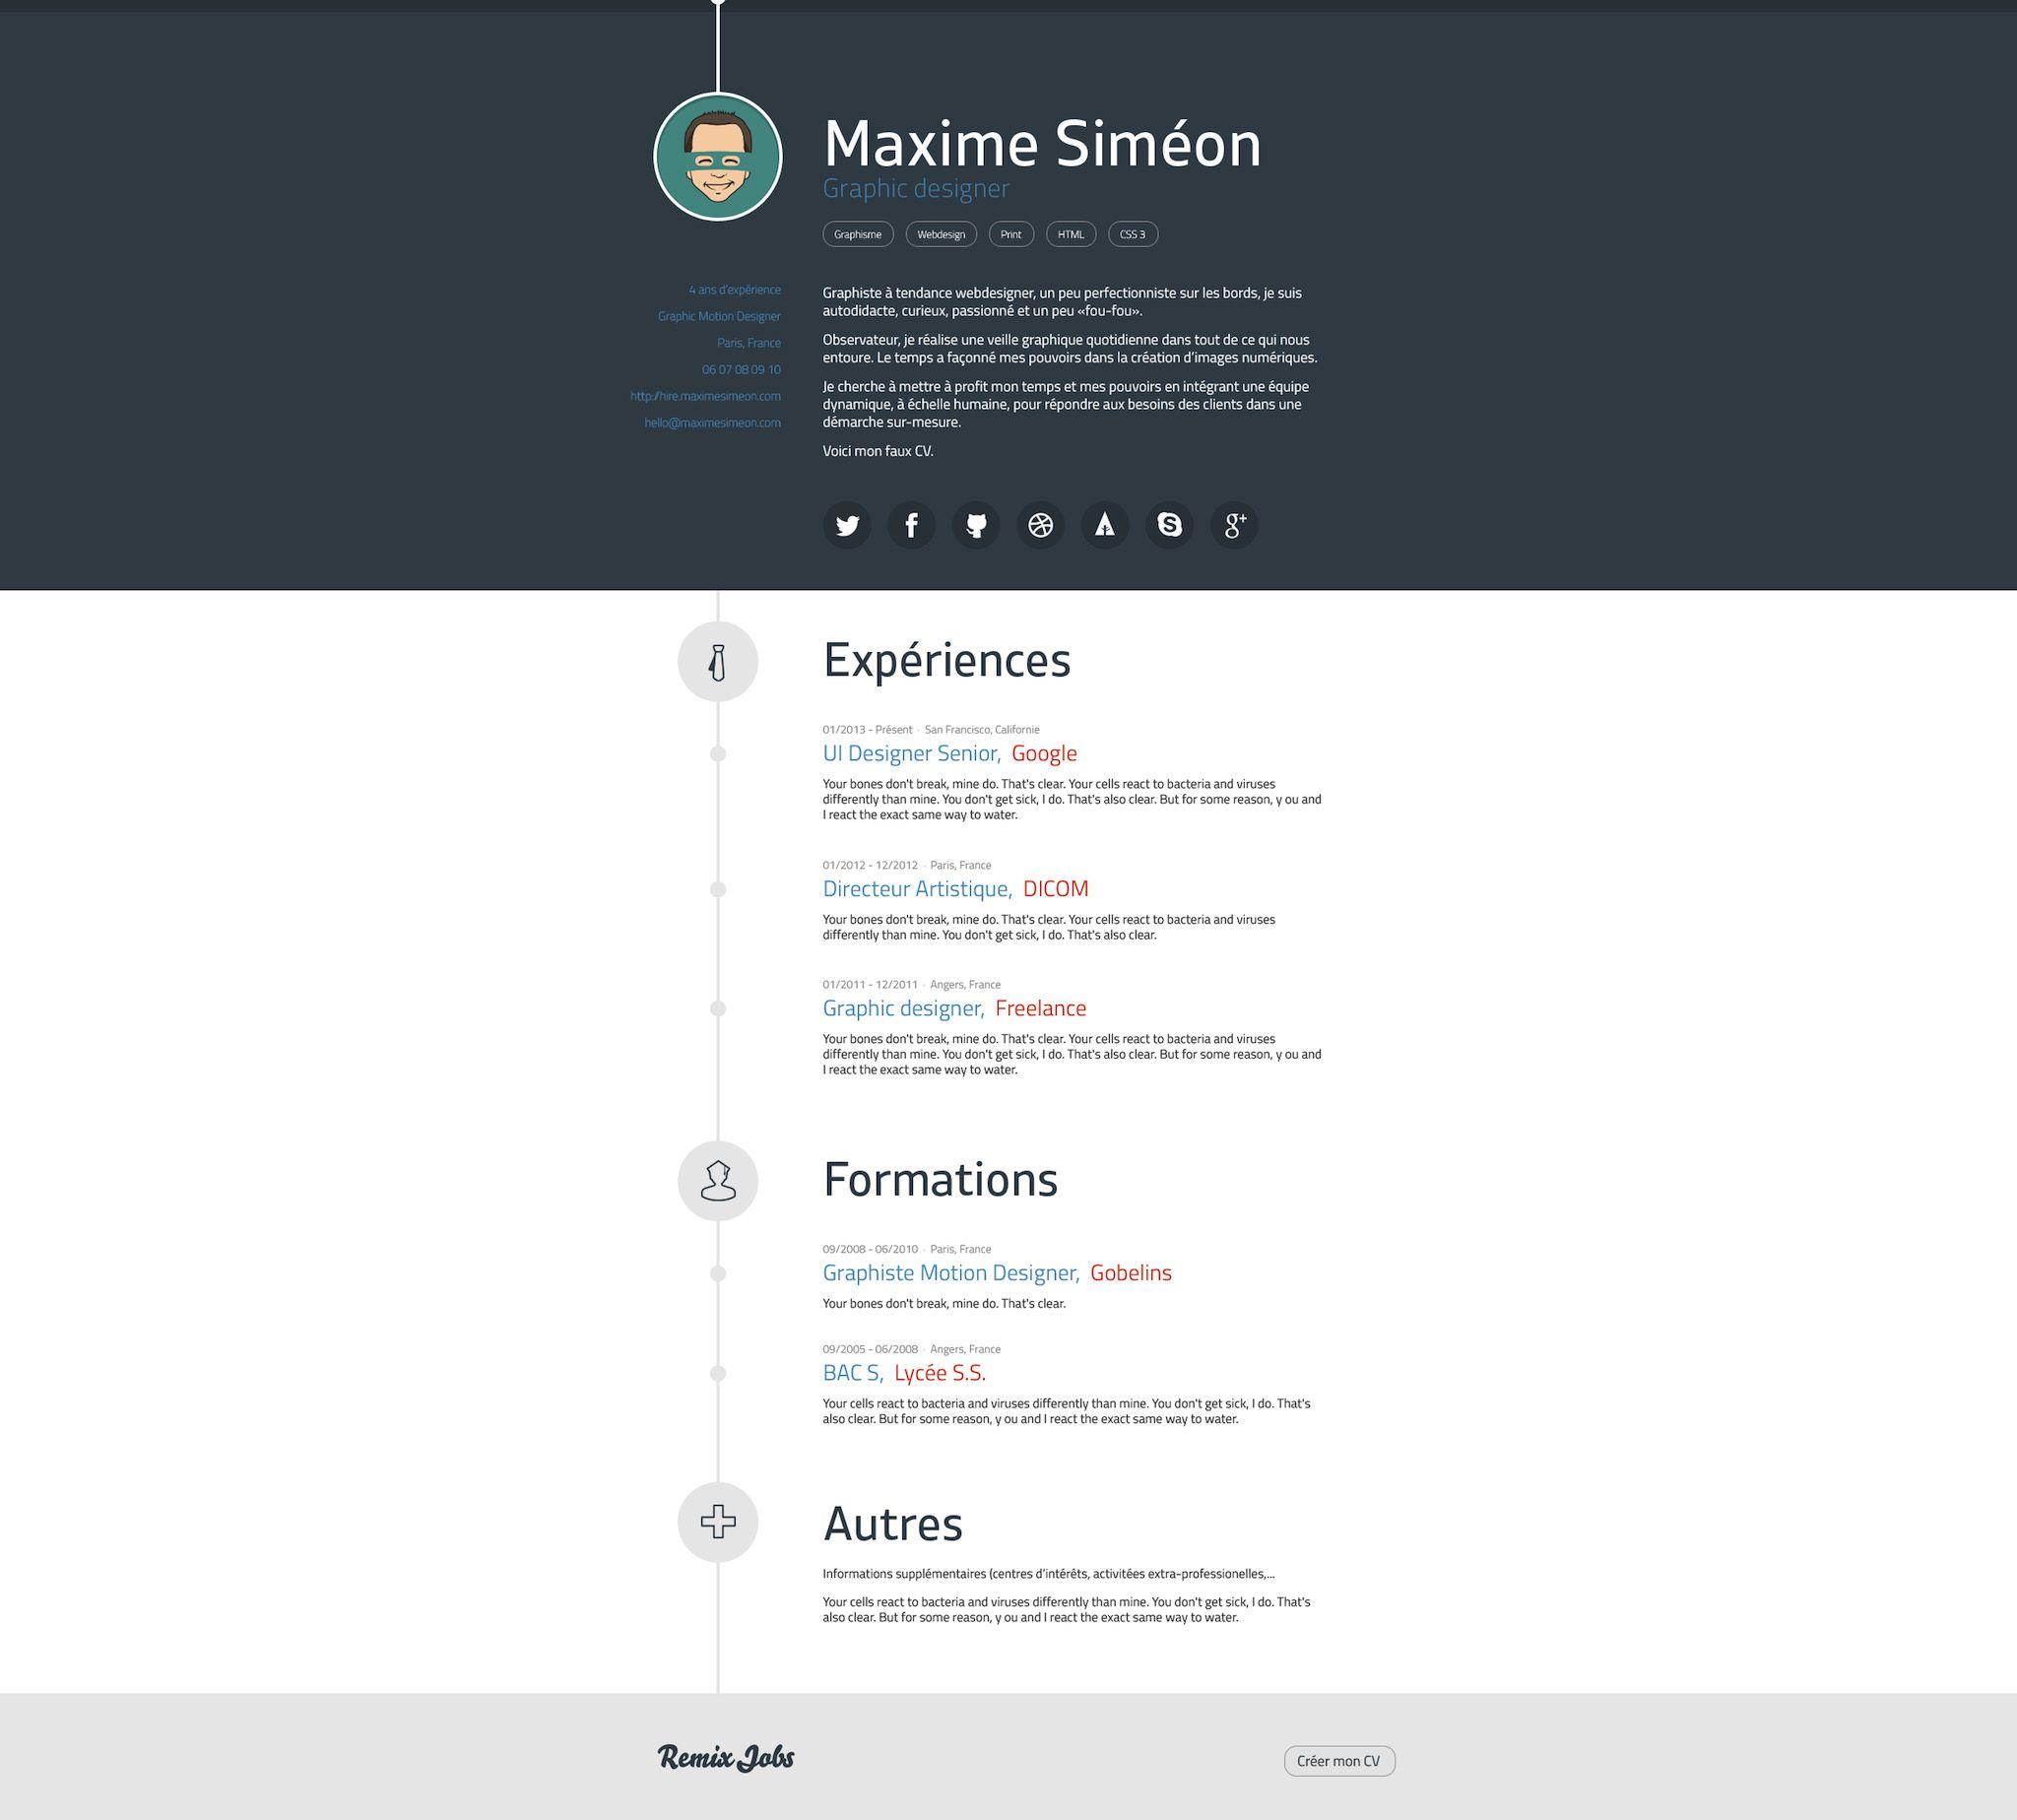 Http Remixjobs Com Blog Wp Content Uploads 2013 07 Maxime Simeon Web Jpg Formation Graphiste Directeur Artistique Jobs